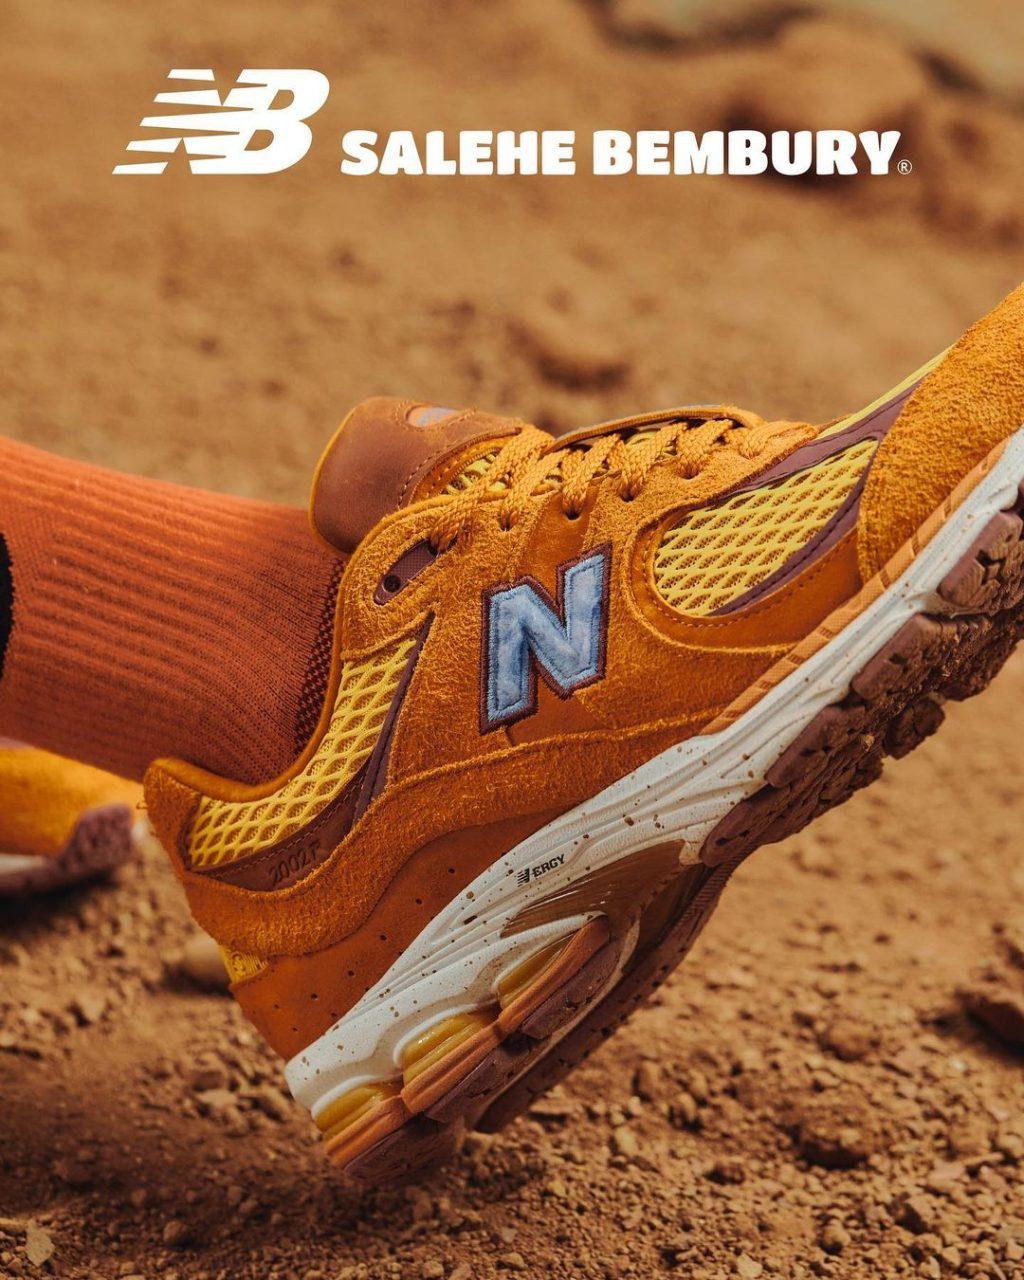 salehe-bembury-new-balance-ml2002r1-release-20201023